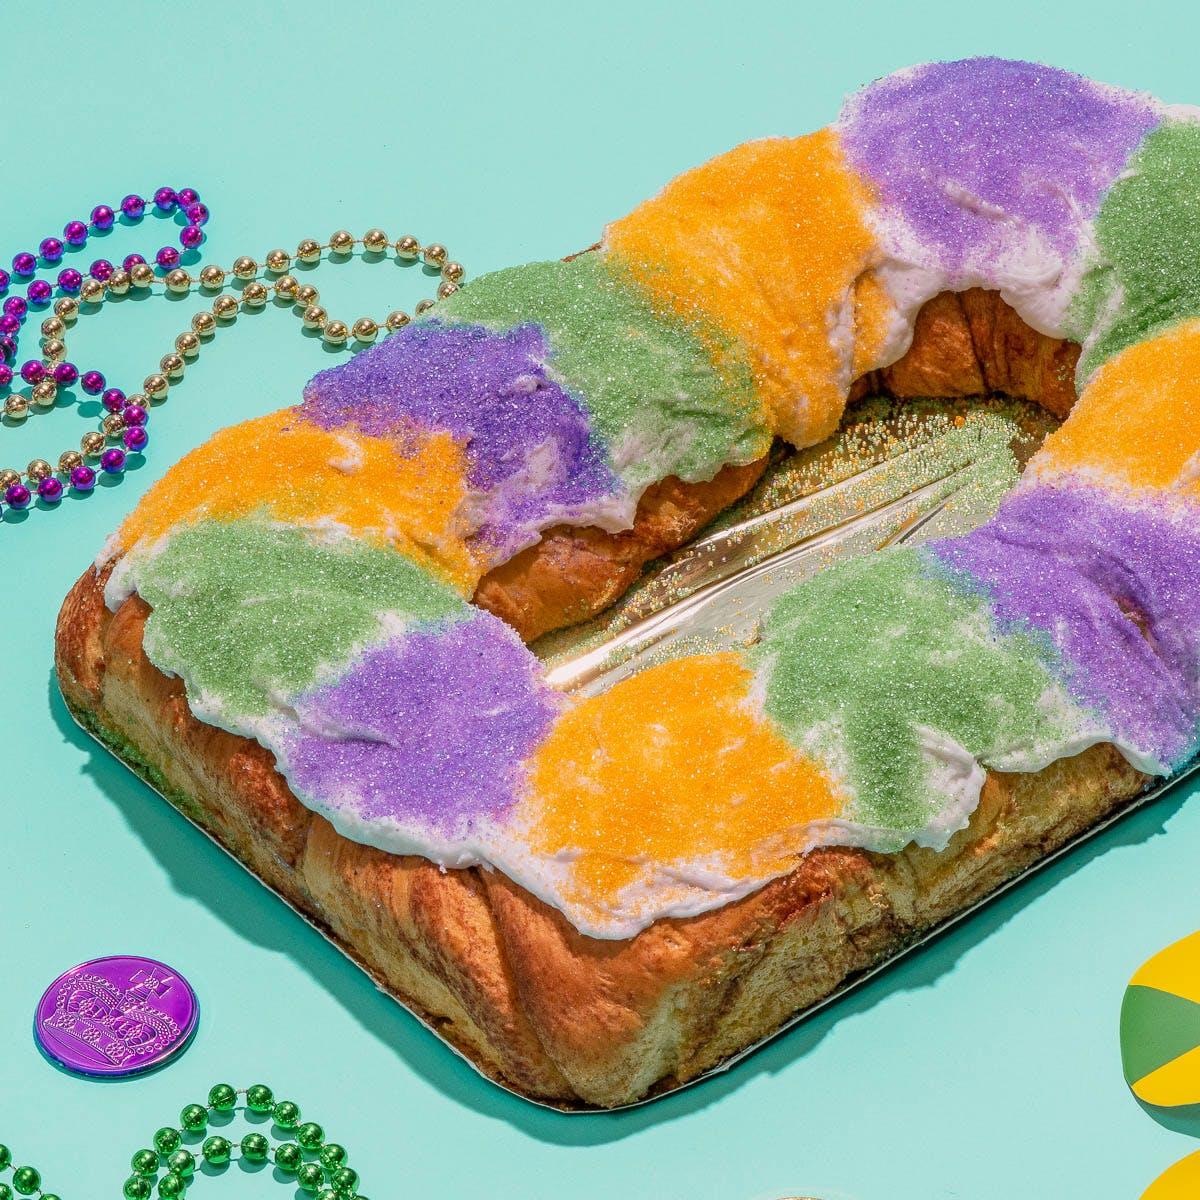 Gambino S Cream Cheese Filled King Cake By Gambino S Bakery King Cakes Goldbelly